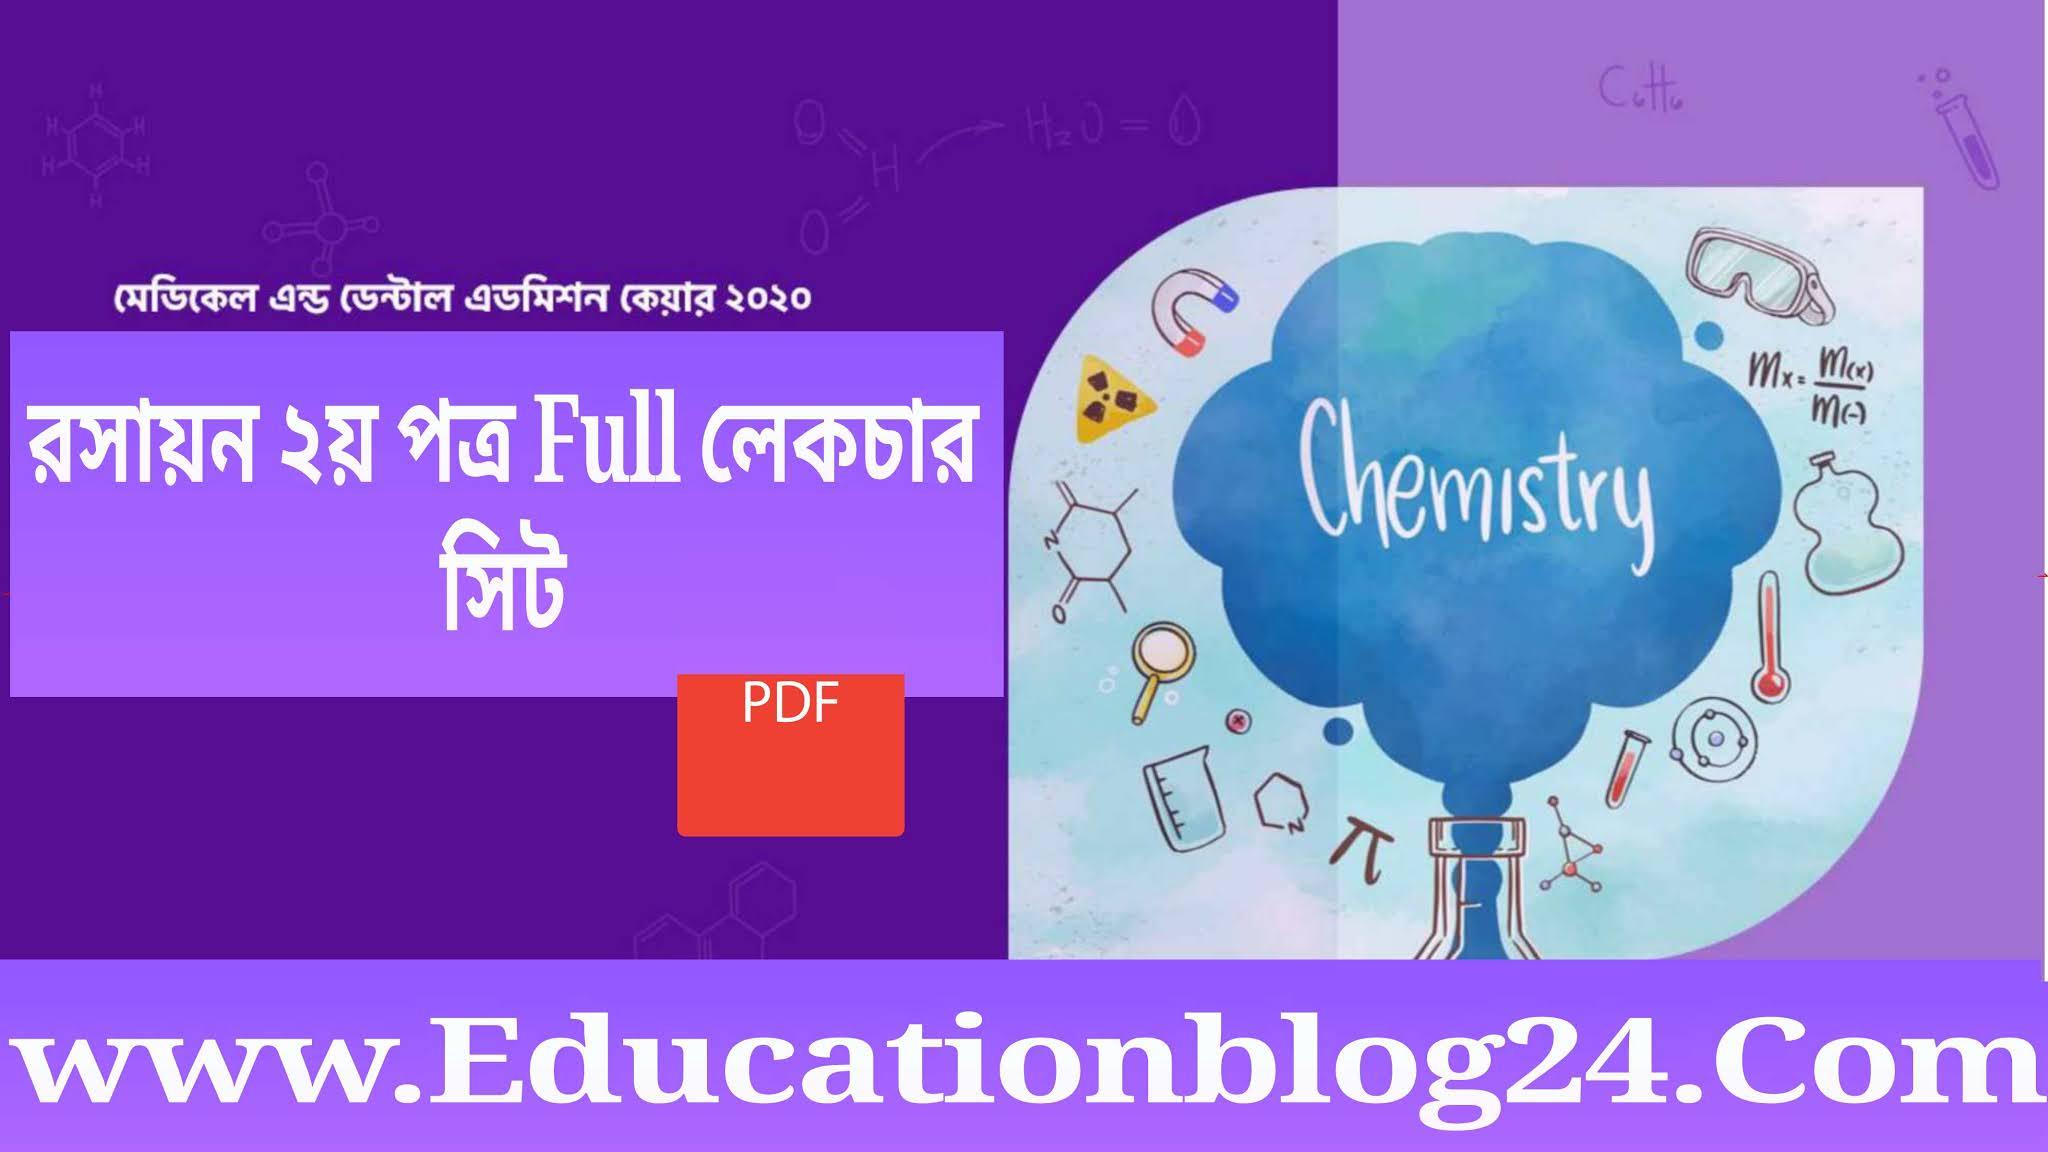 Udvash Online Class -Chemistry 2nd Paper Pdf Download |উদ্ভাস রসায়ন ২য় পত্র লেকচার সিট Pdf Download